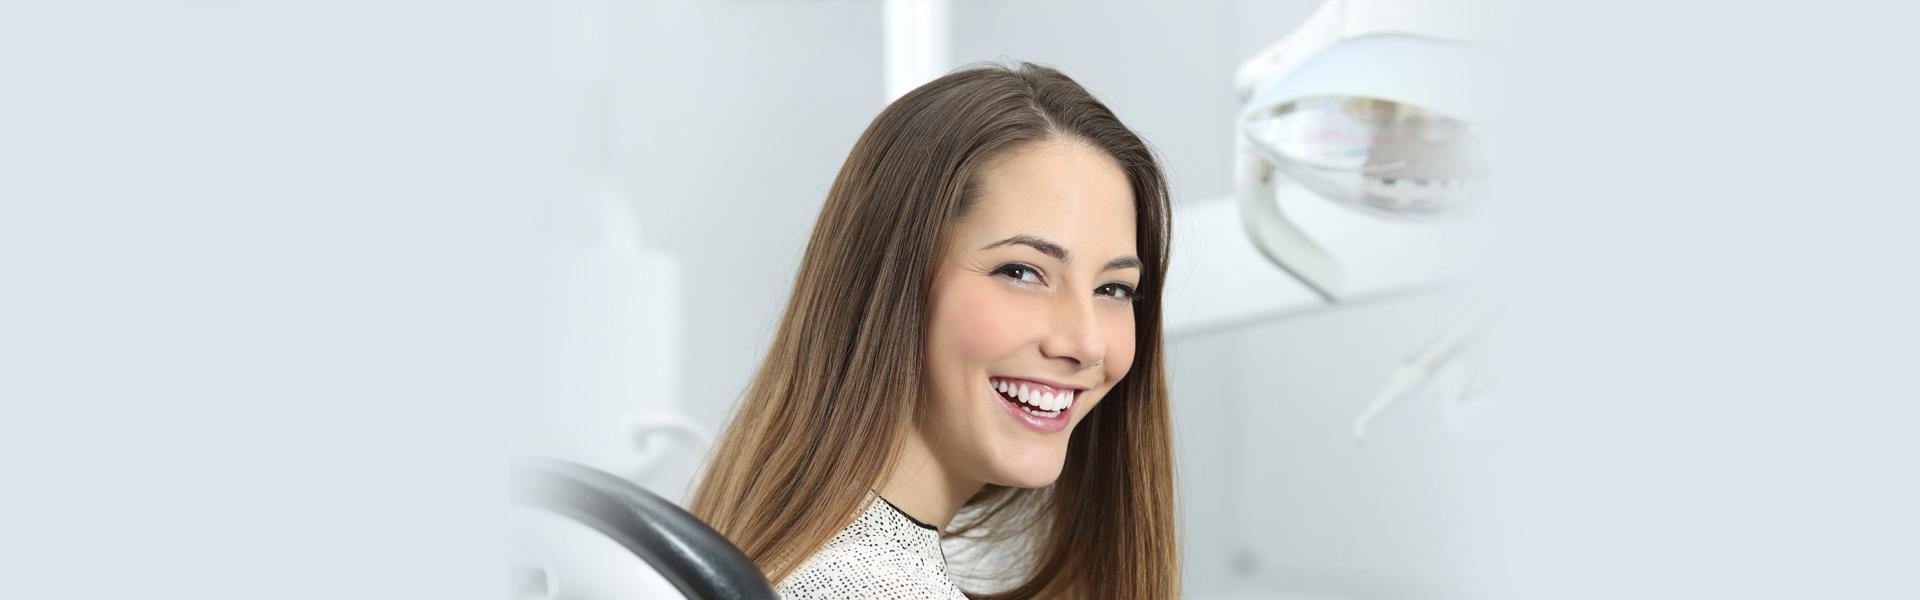 Is Teeth Grinding Detrimental To Your Dental Health?